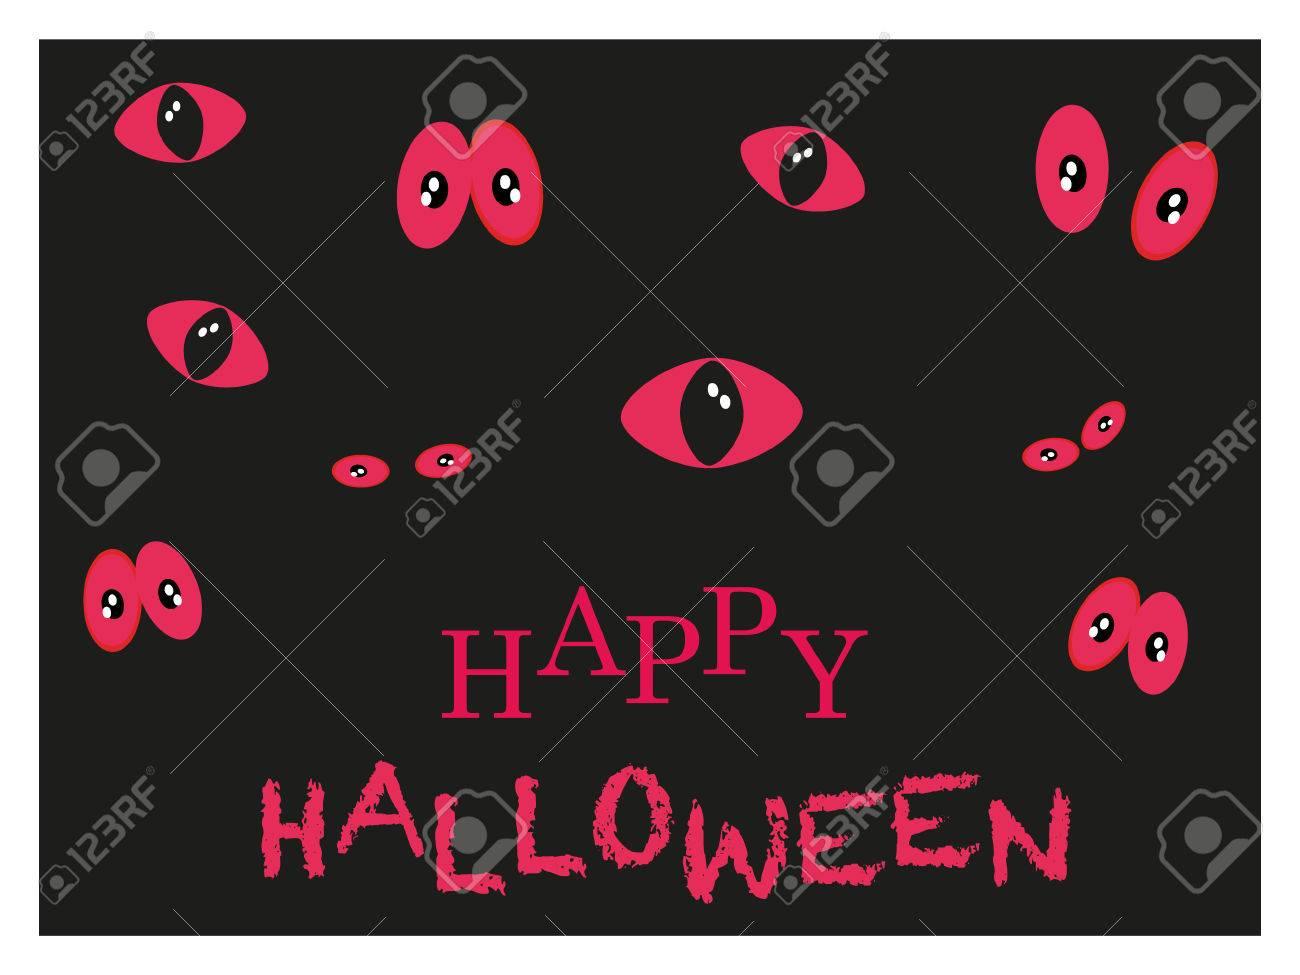 Spooky Red Eyes Glowing In The Dark Happy Halloween Card Stock Vector    42706846